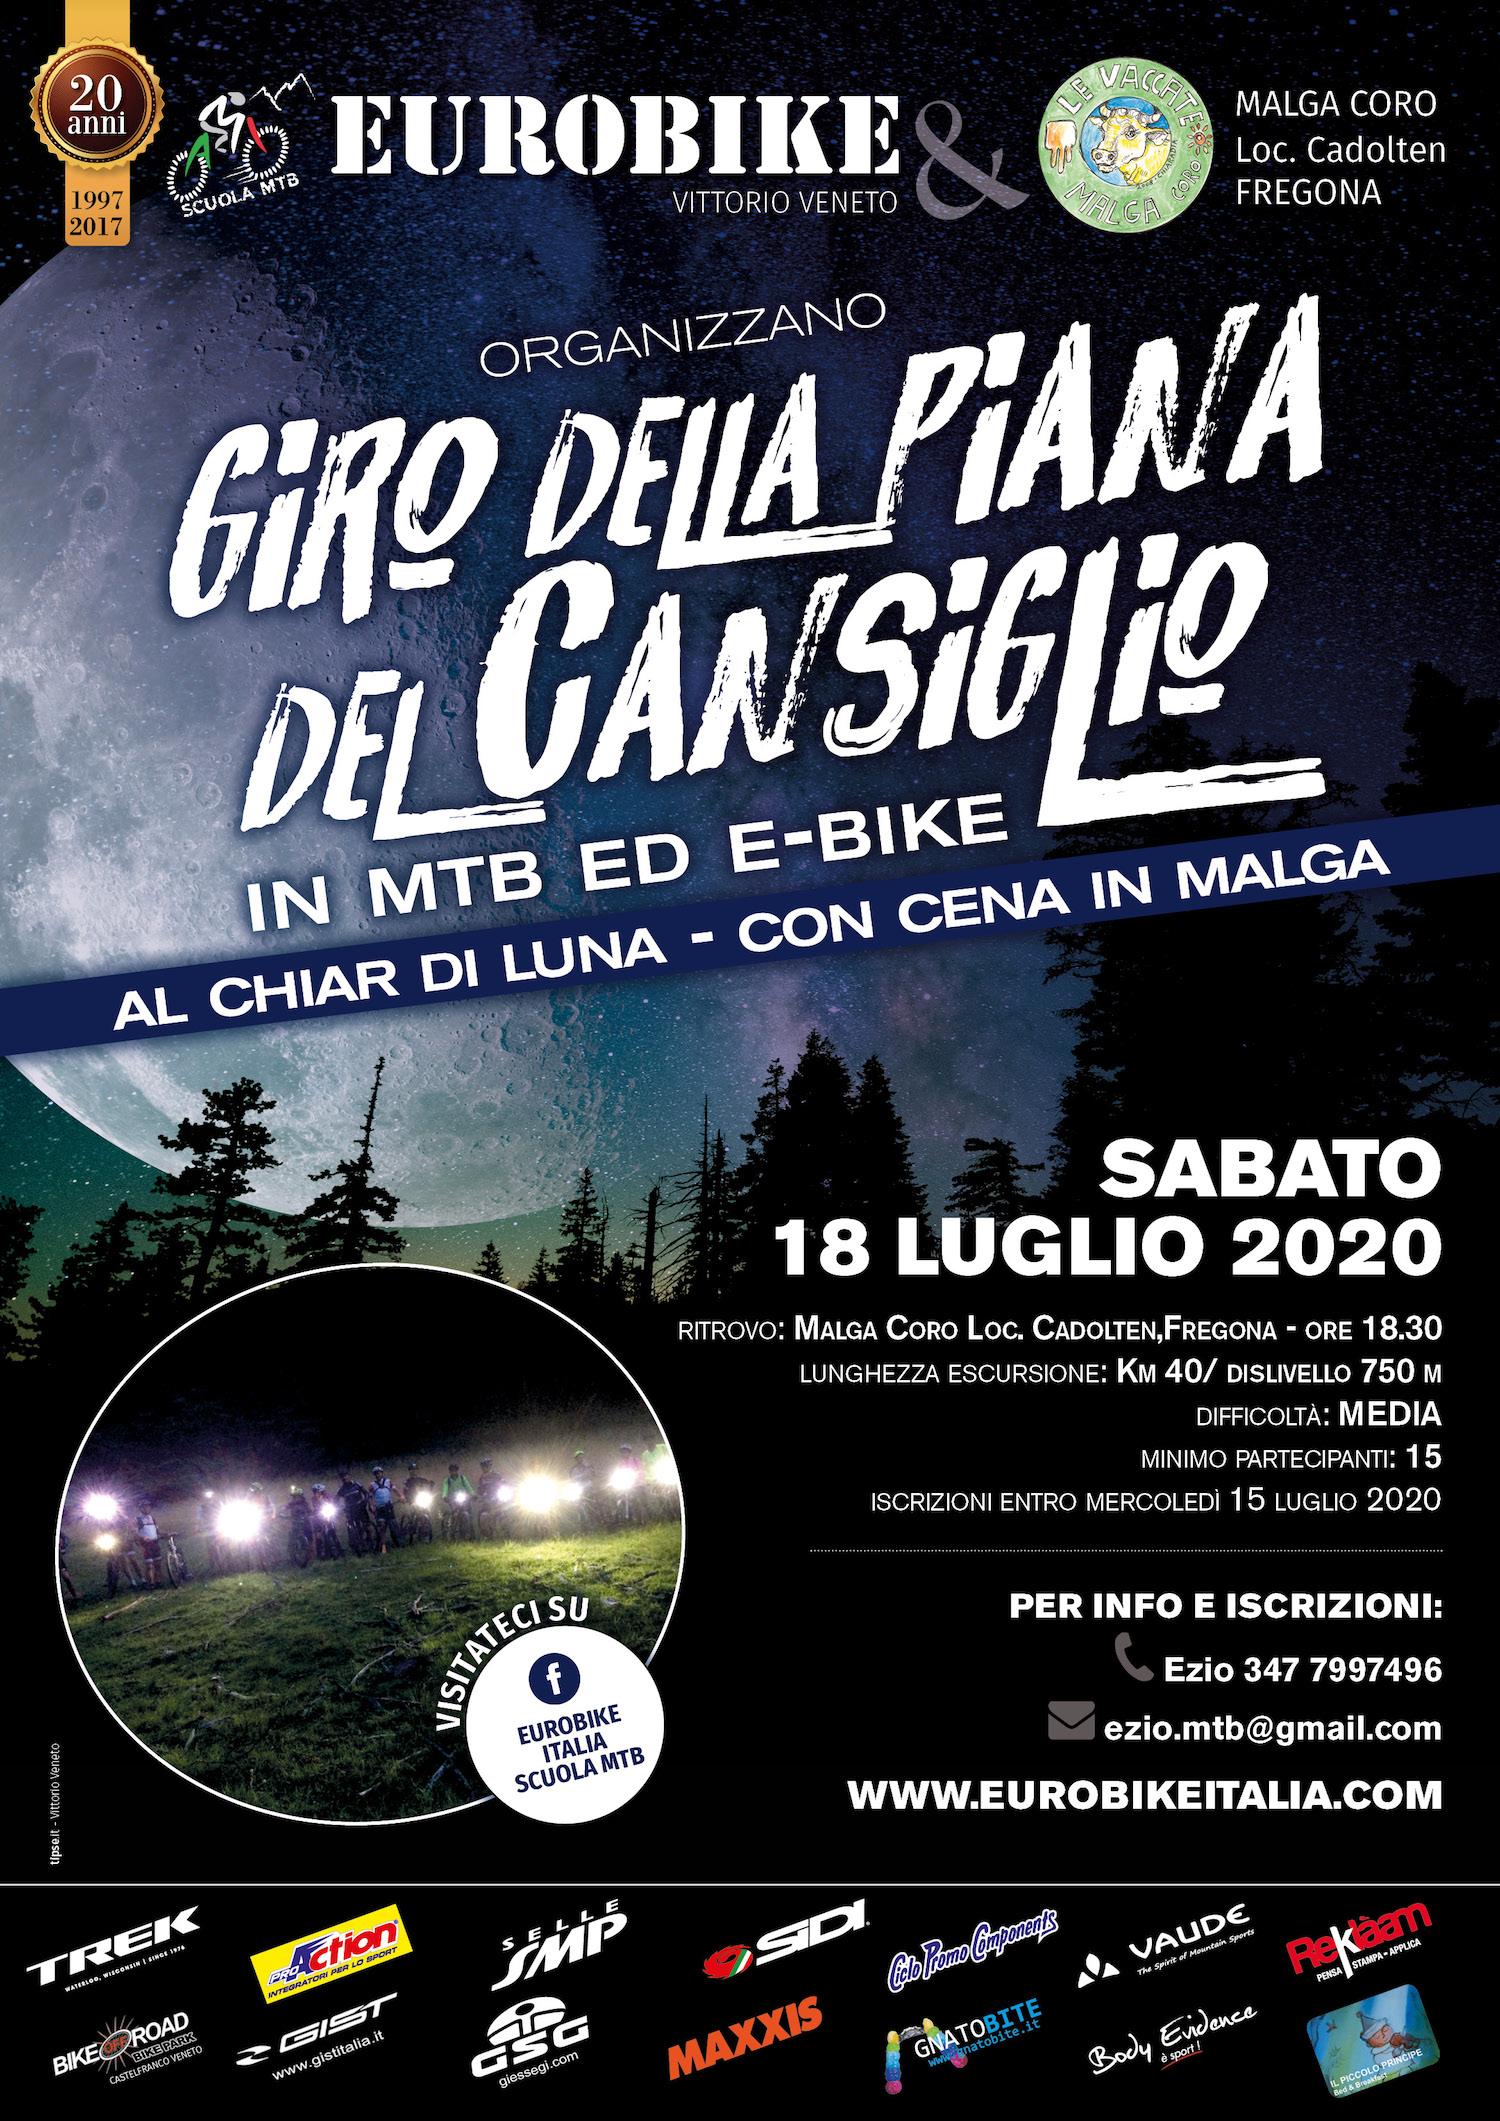 200704 notturna Cansiglio luglio 2020